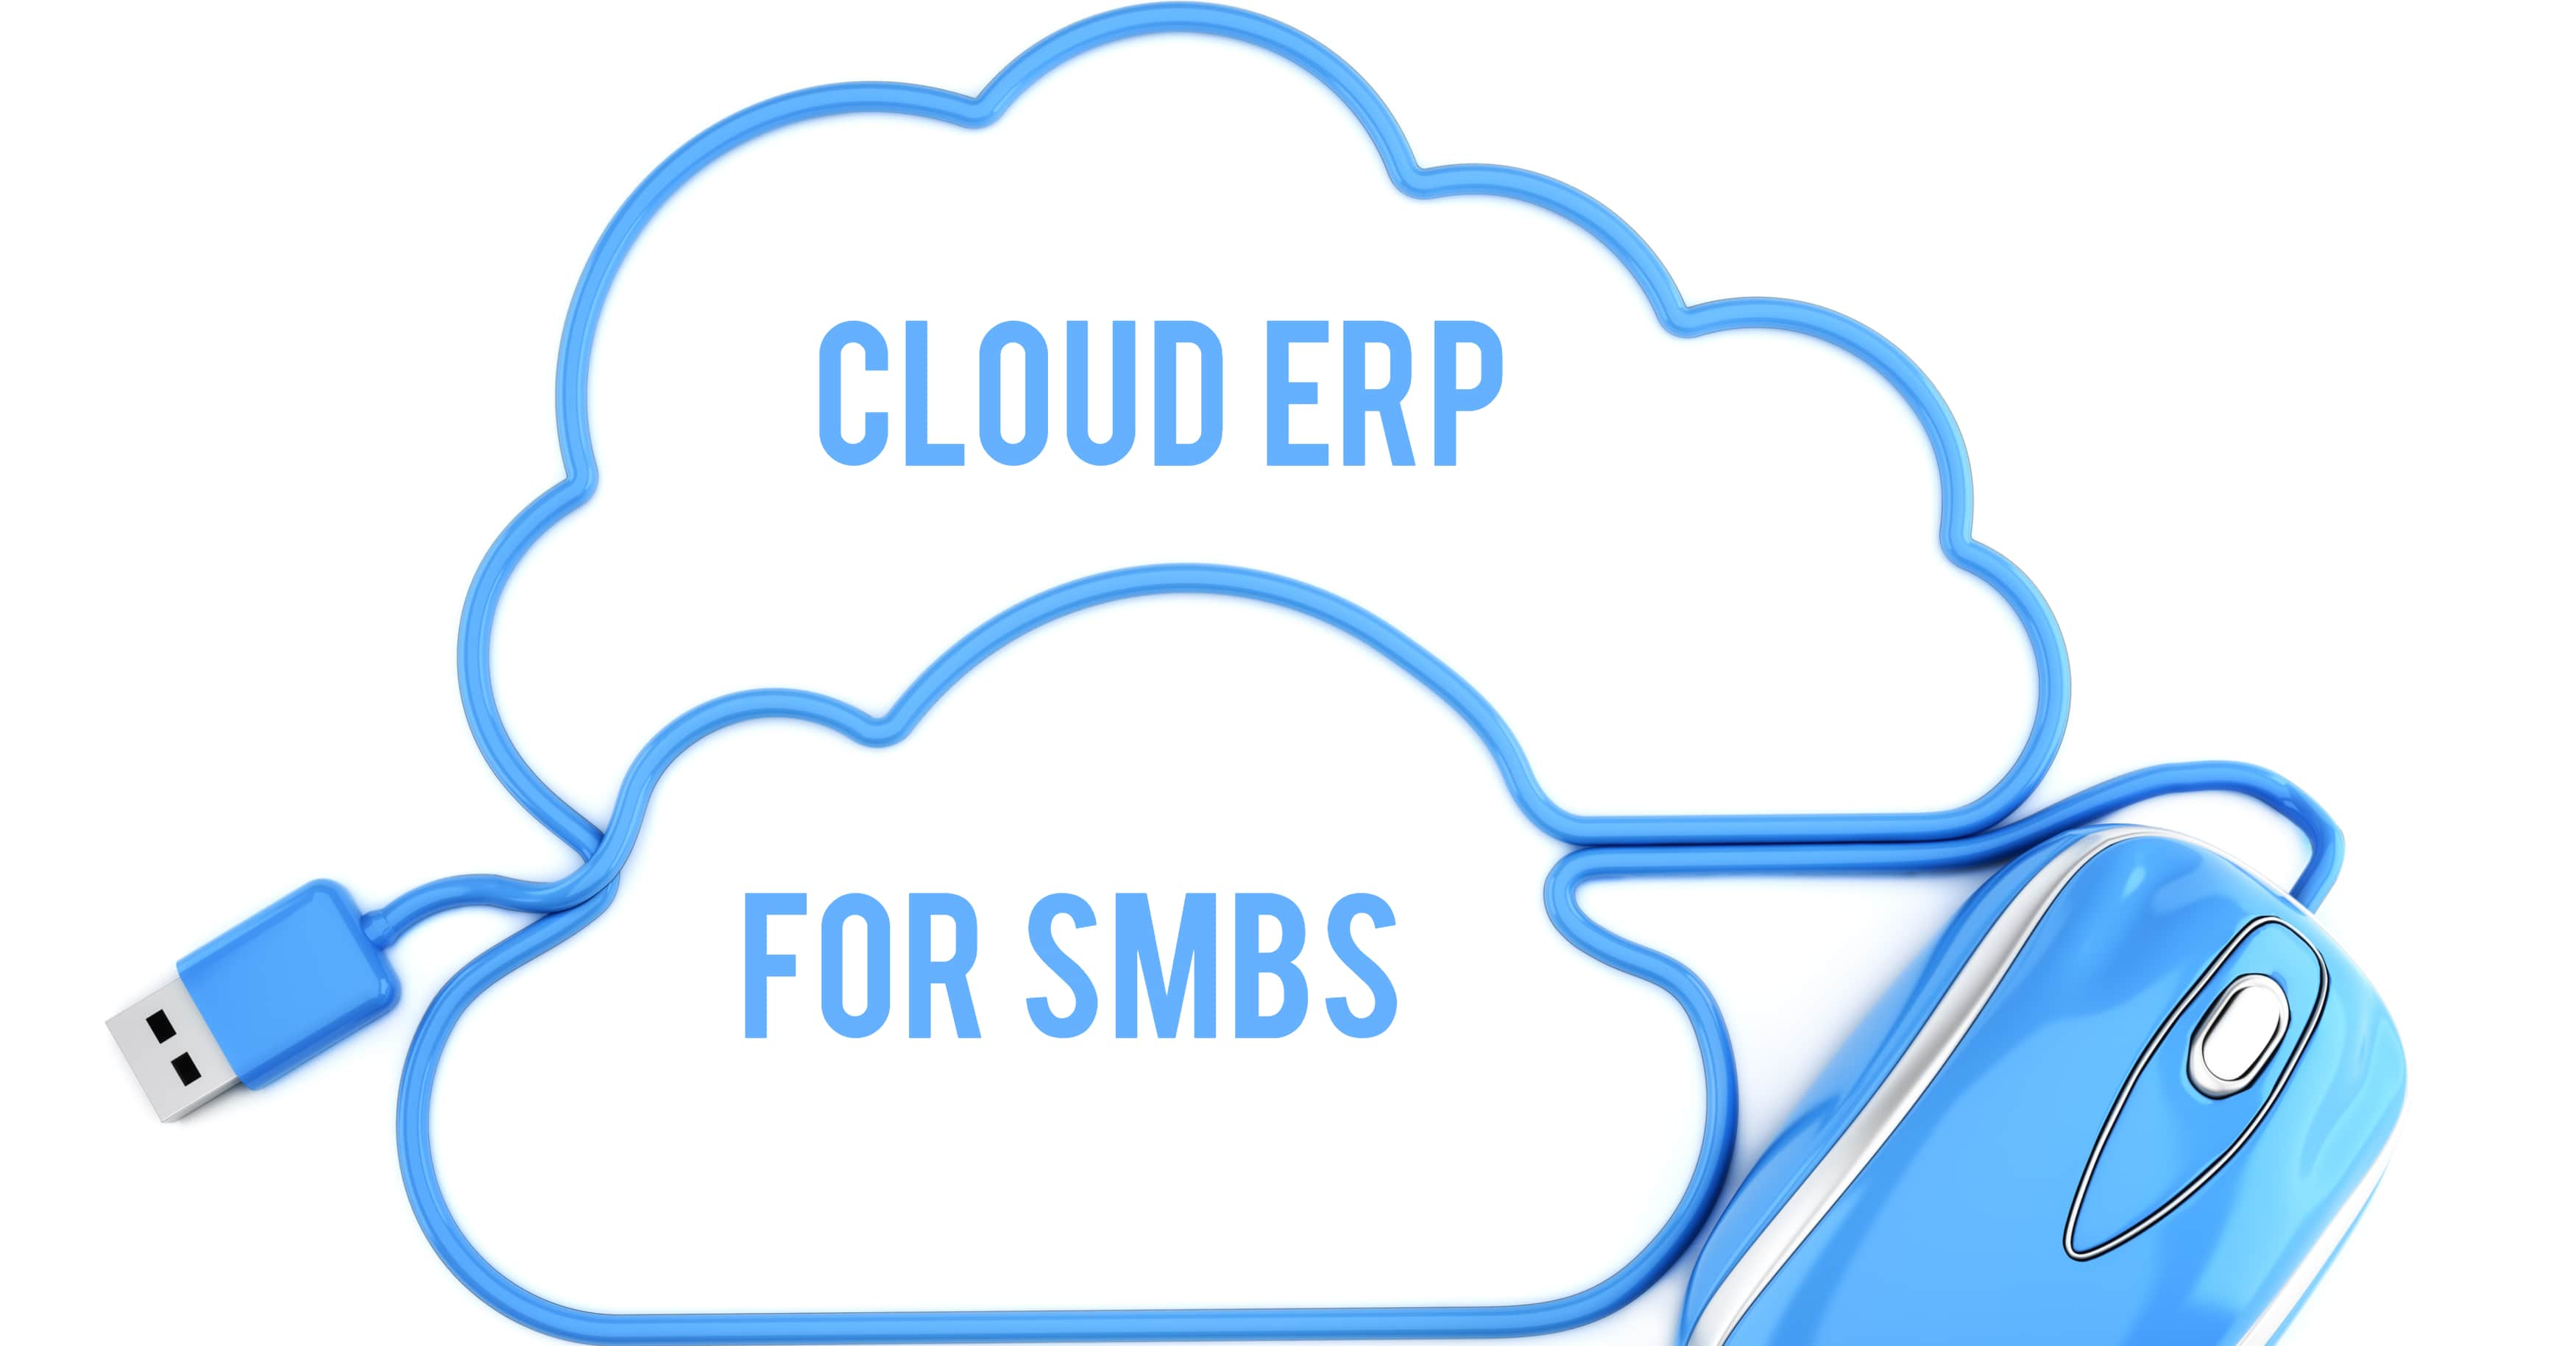 SMB Cloud ERP